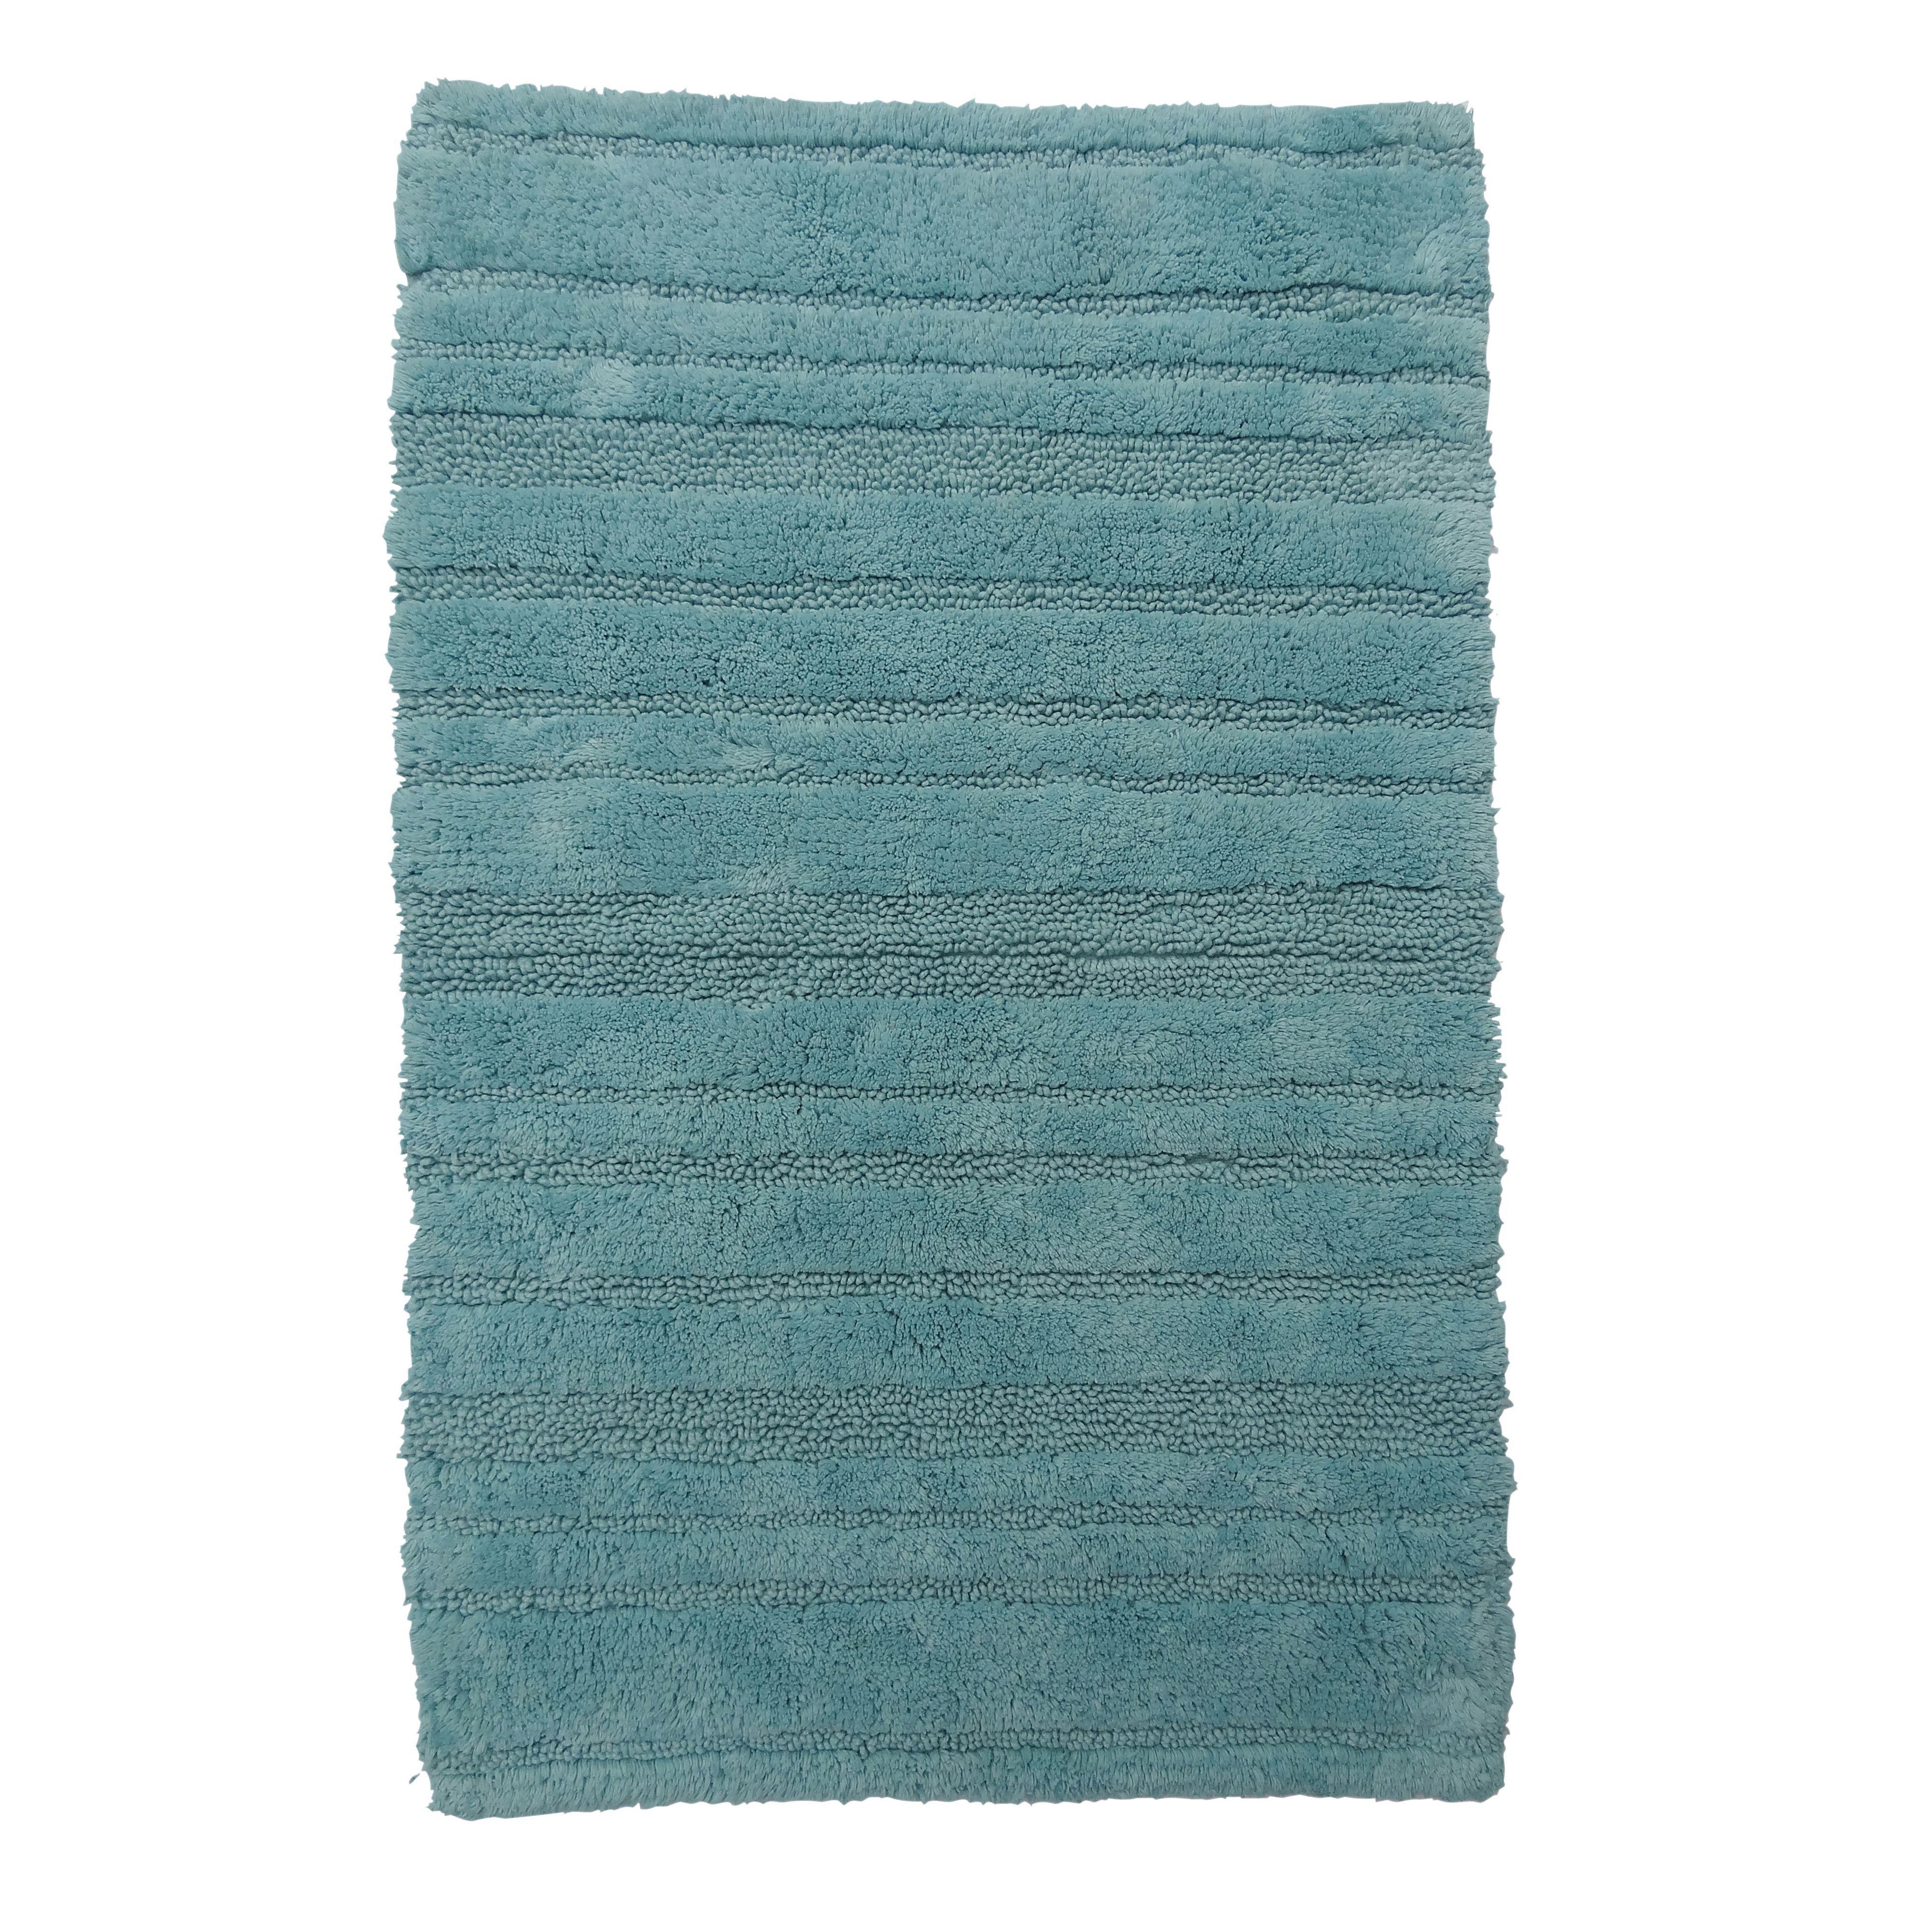 Duck Egg Blue Bathroom Accessories Stripe Bathroom Accessories Diy